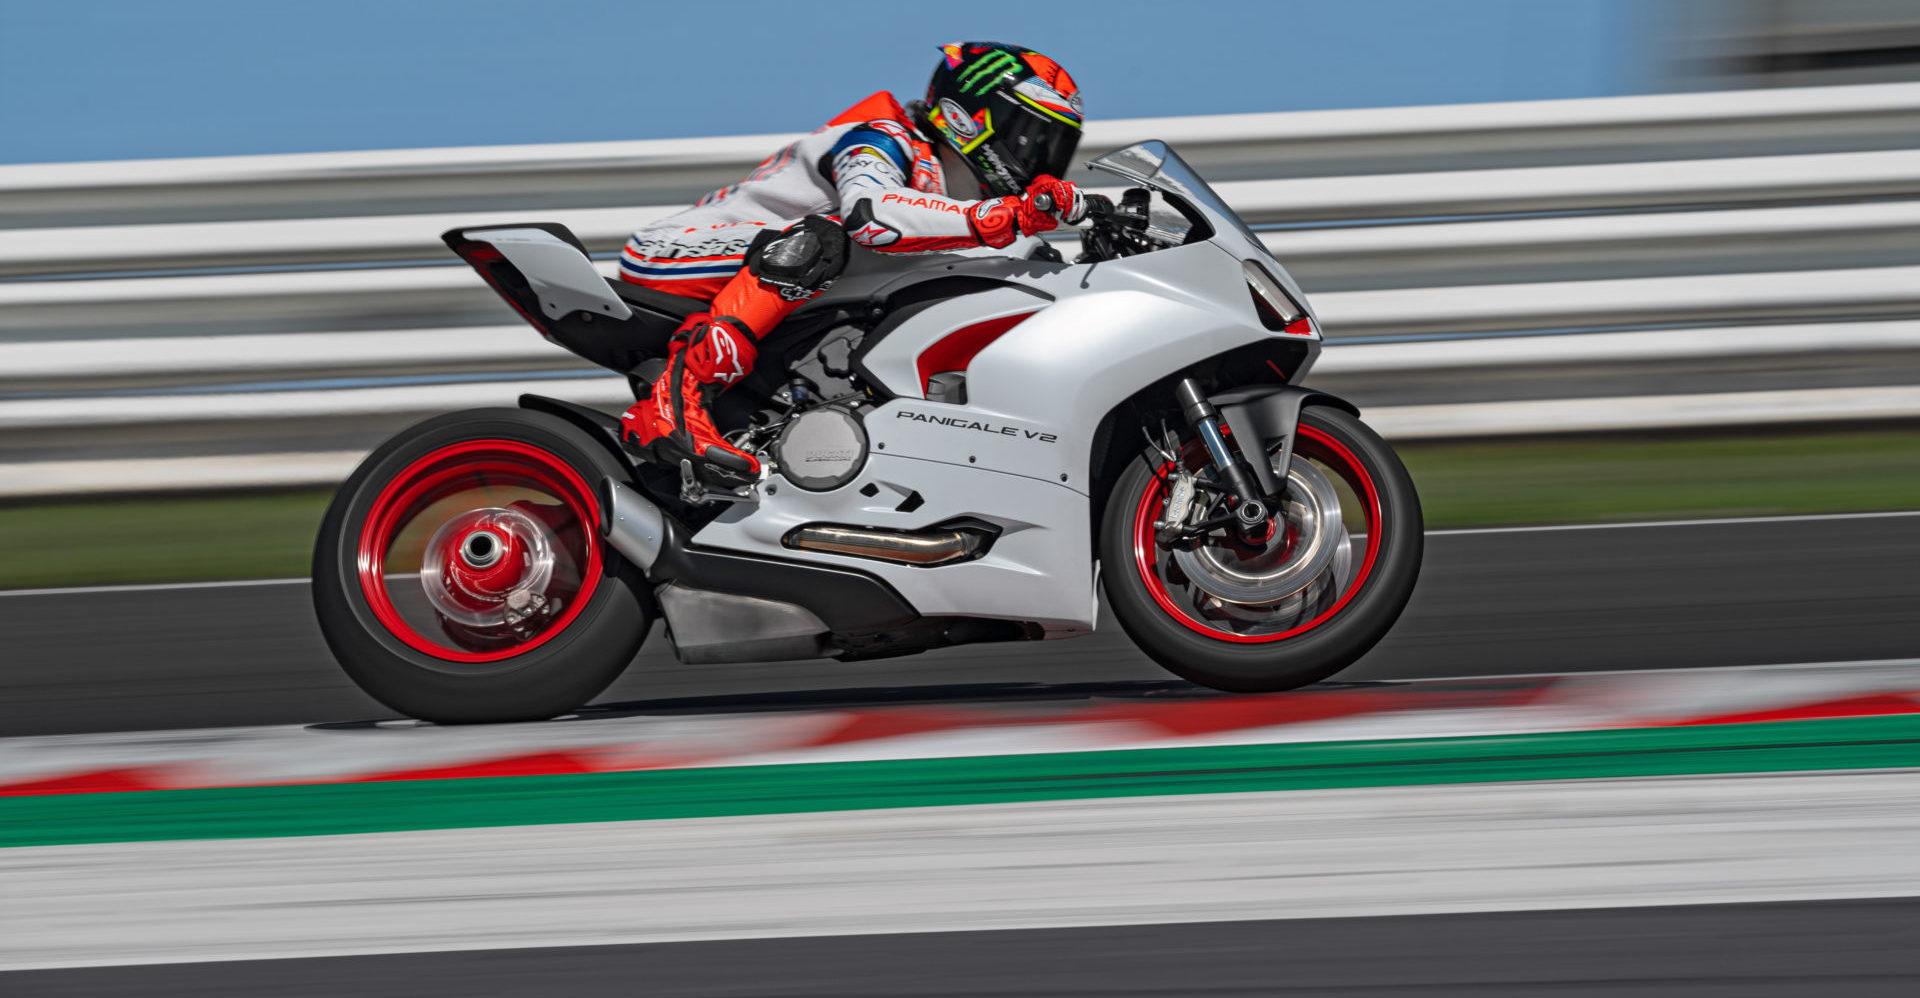 Francesco Bagnaia at speed on a Ducati Panigale V2 White Rosso at Misano. Photo courtesy Ducati.